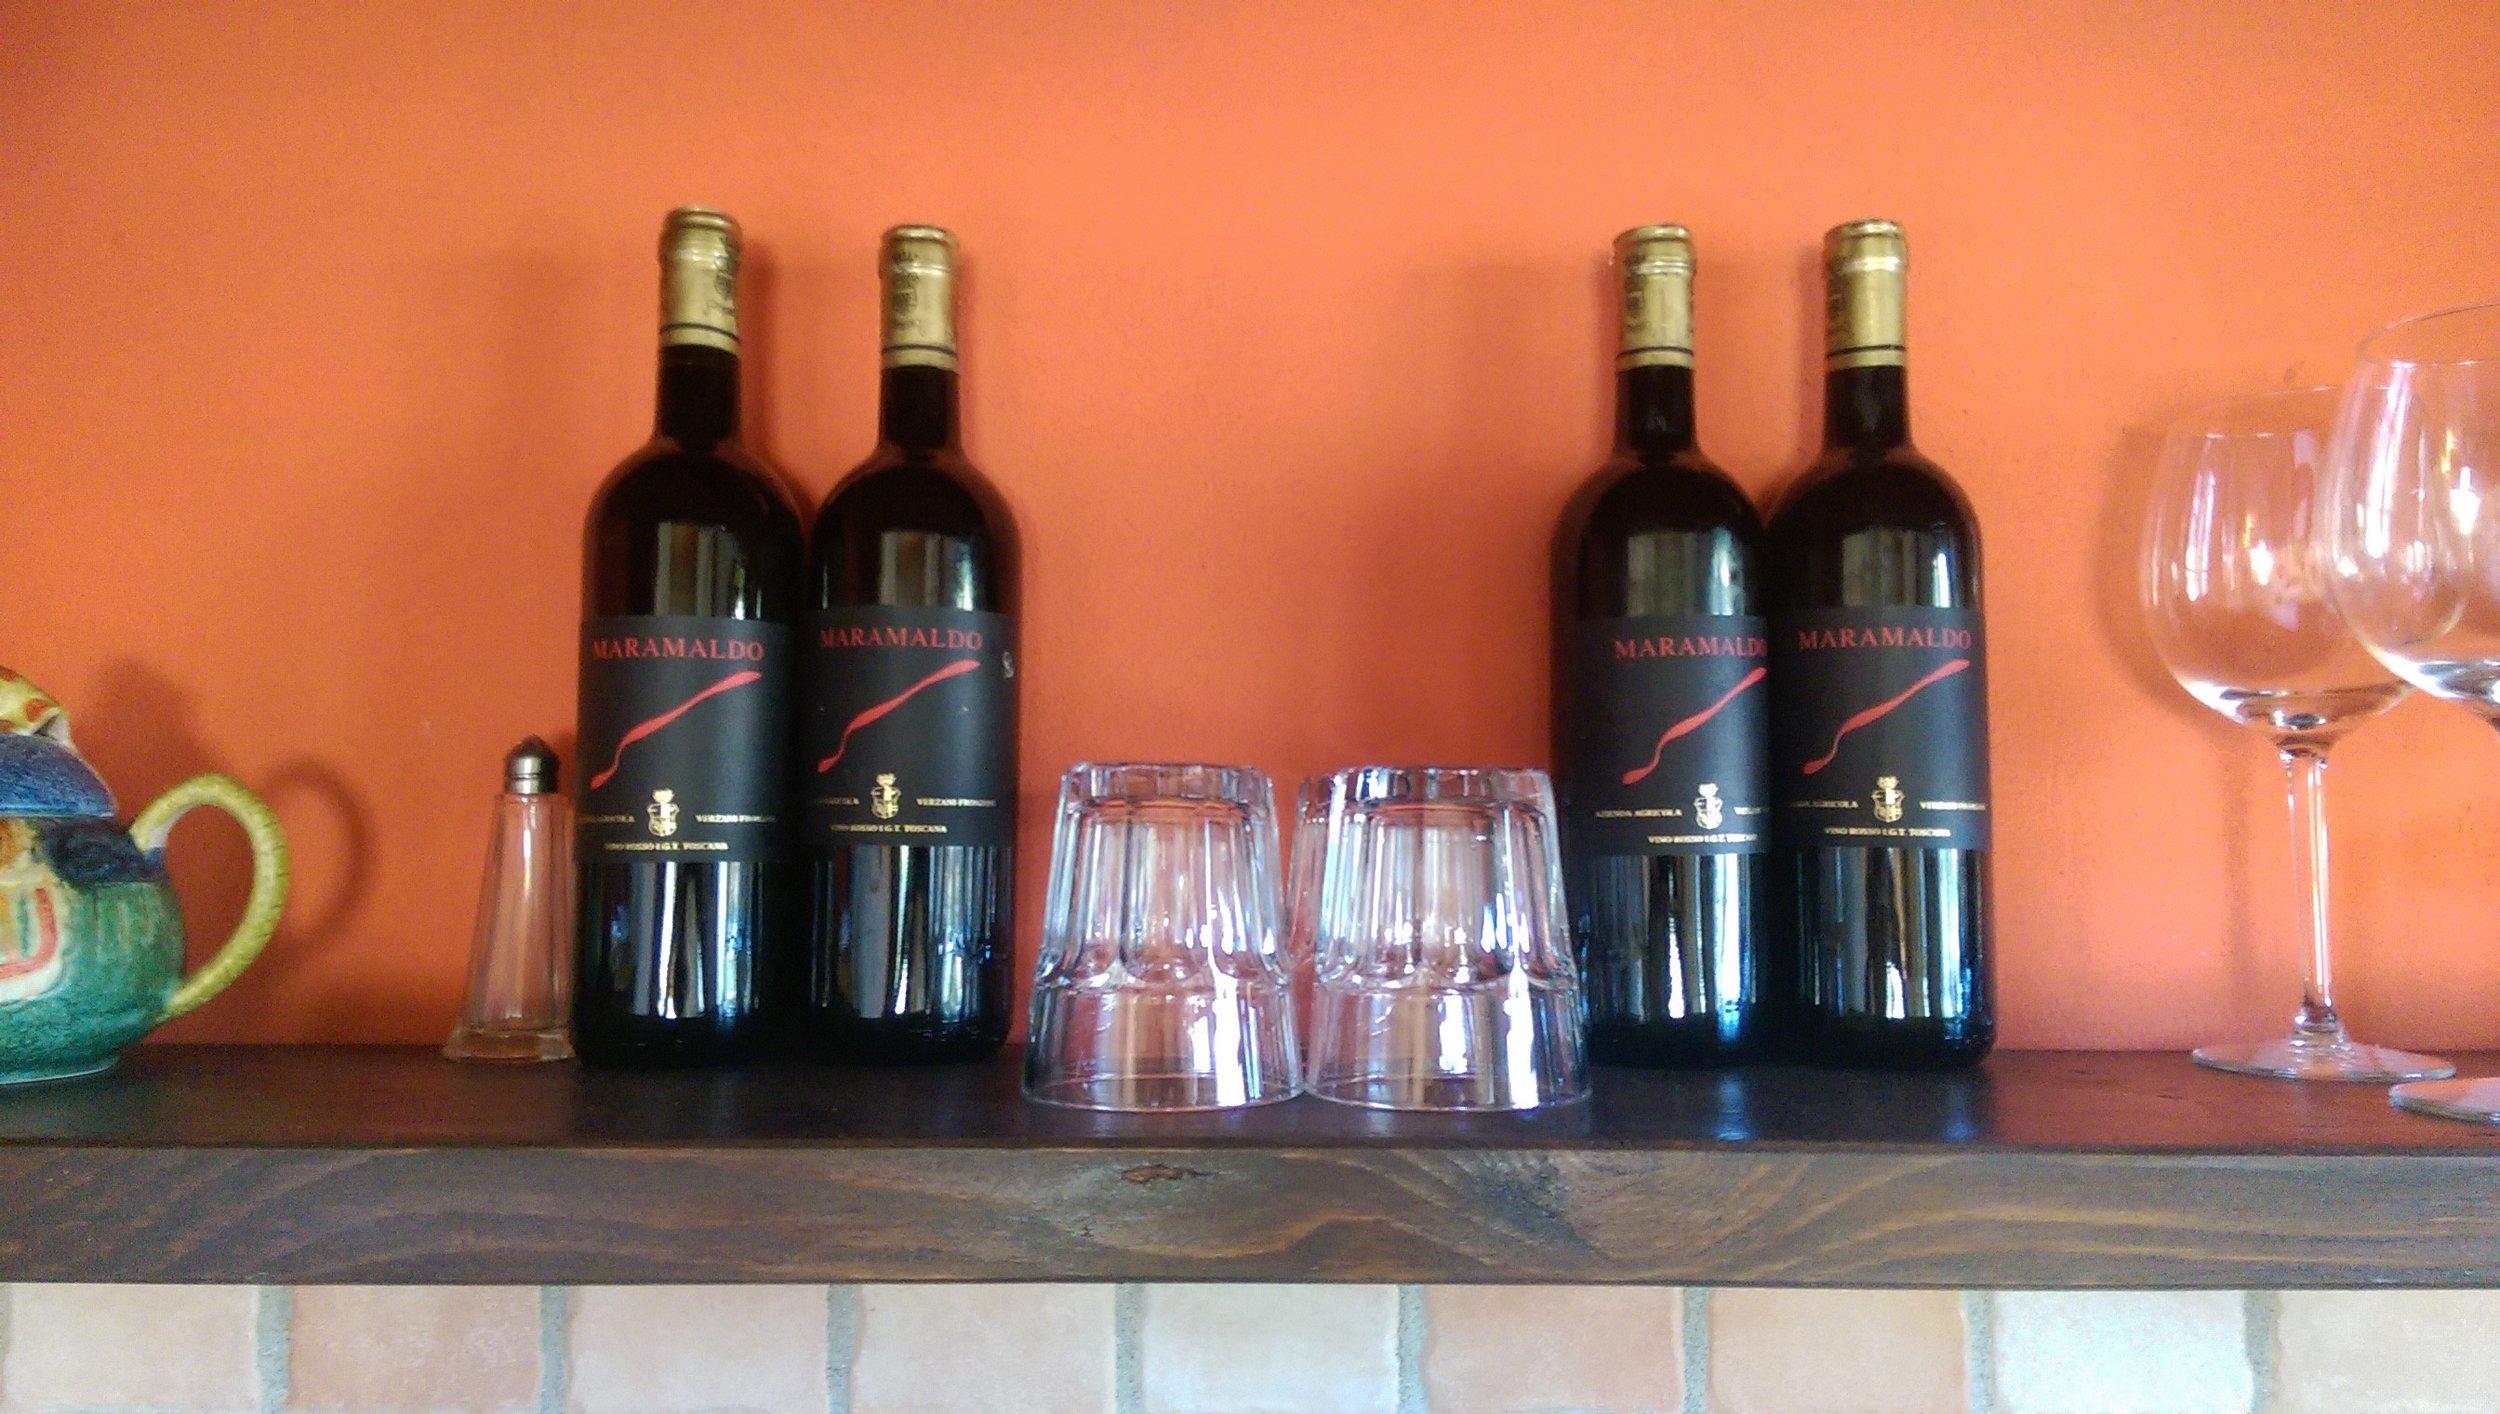 Maramaldo wines